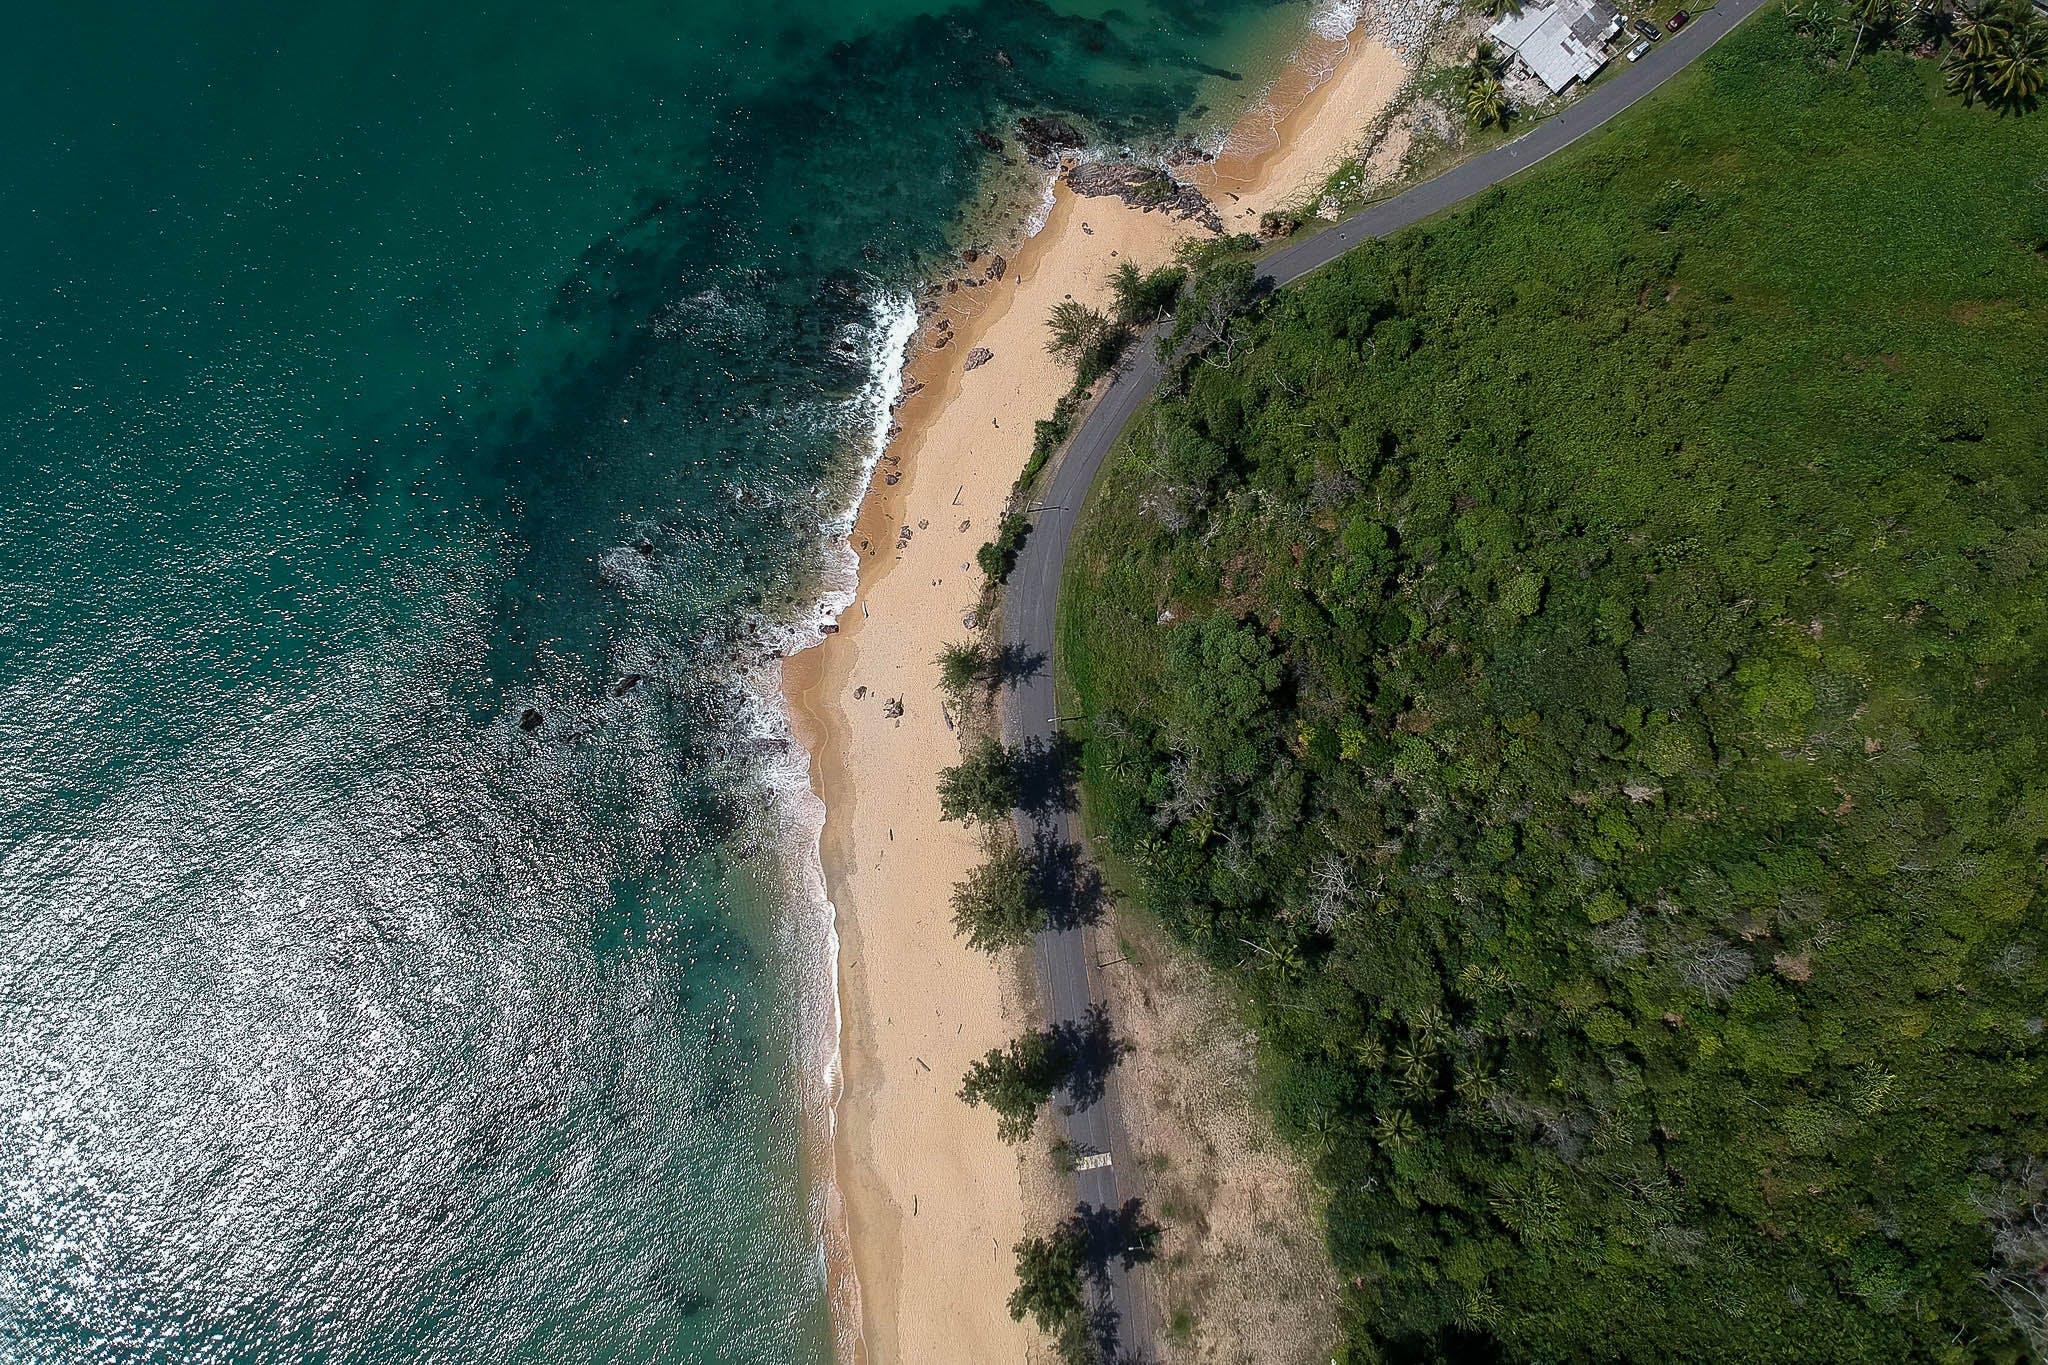 Bird's-eye View Photo of Island